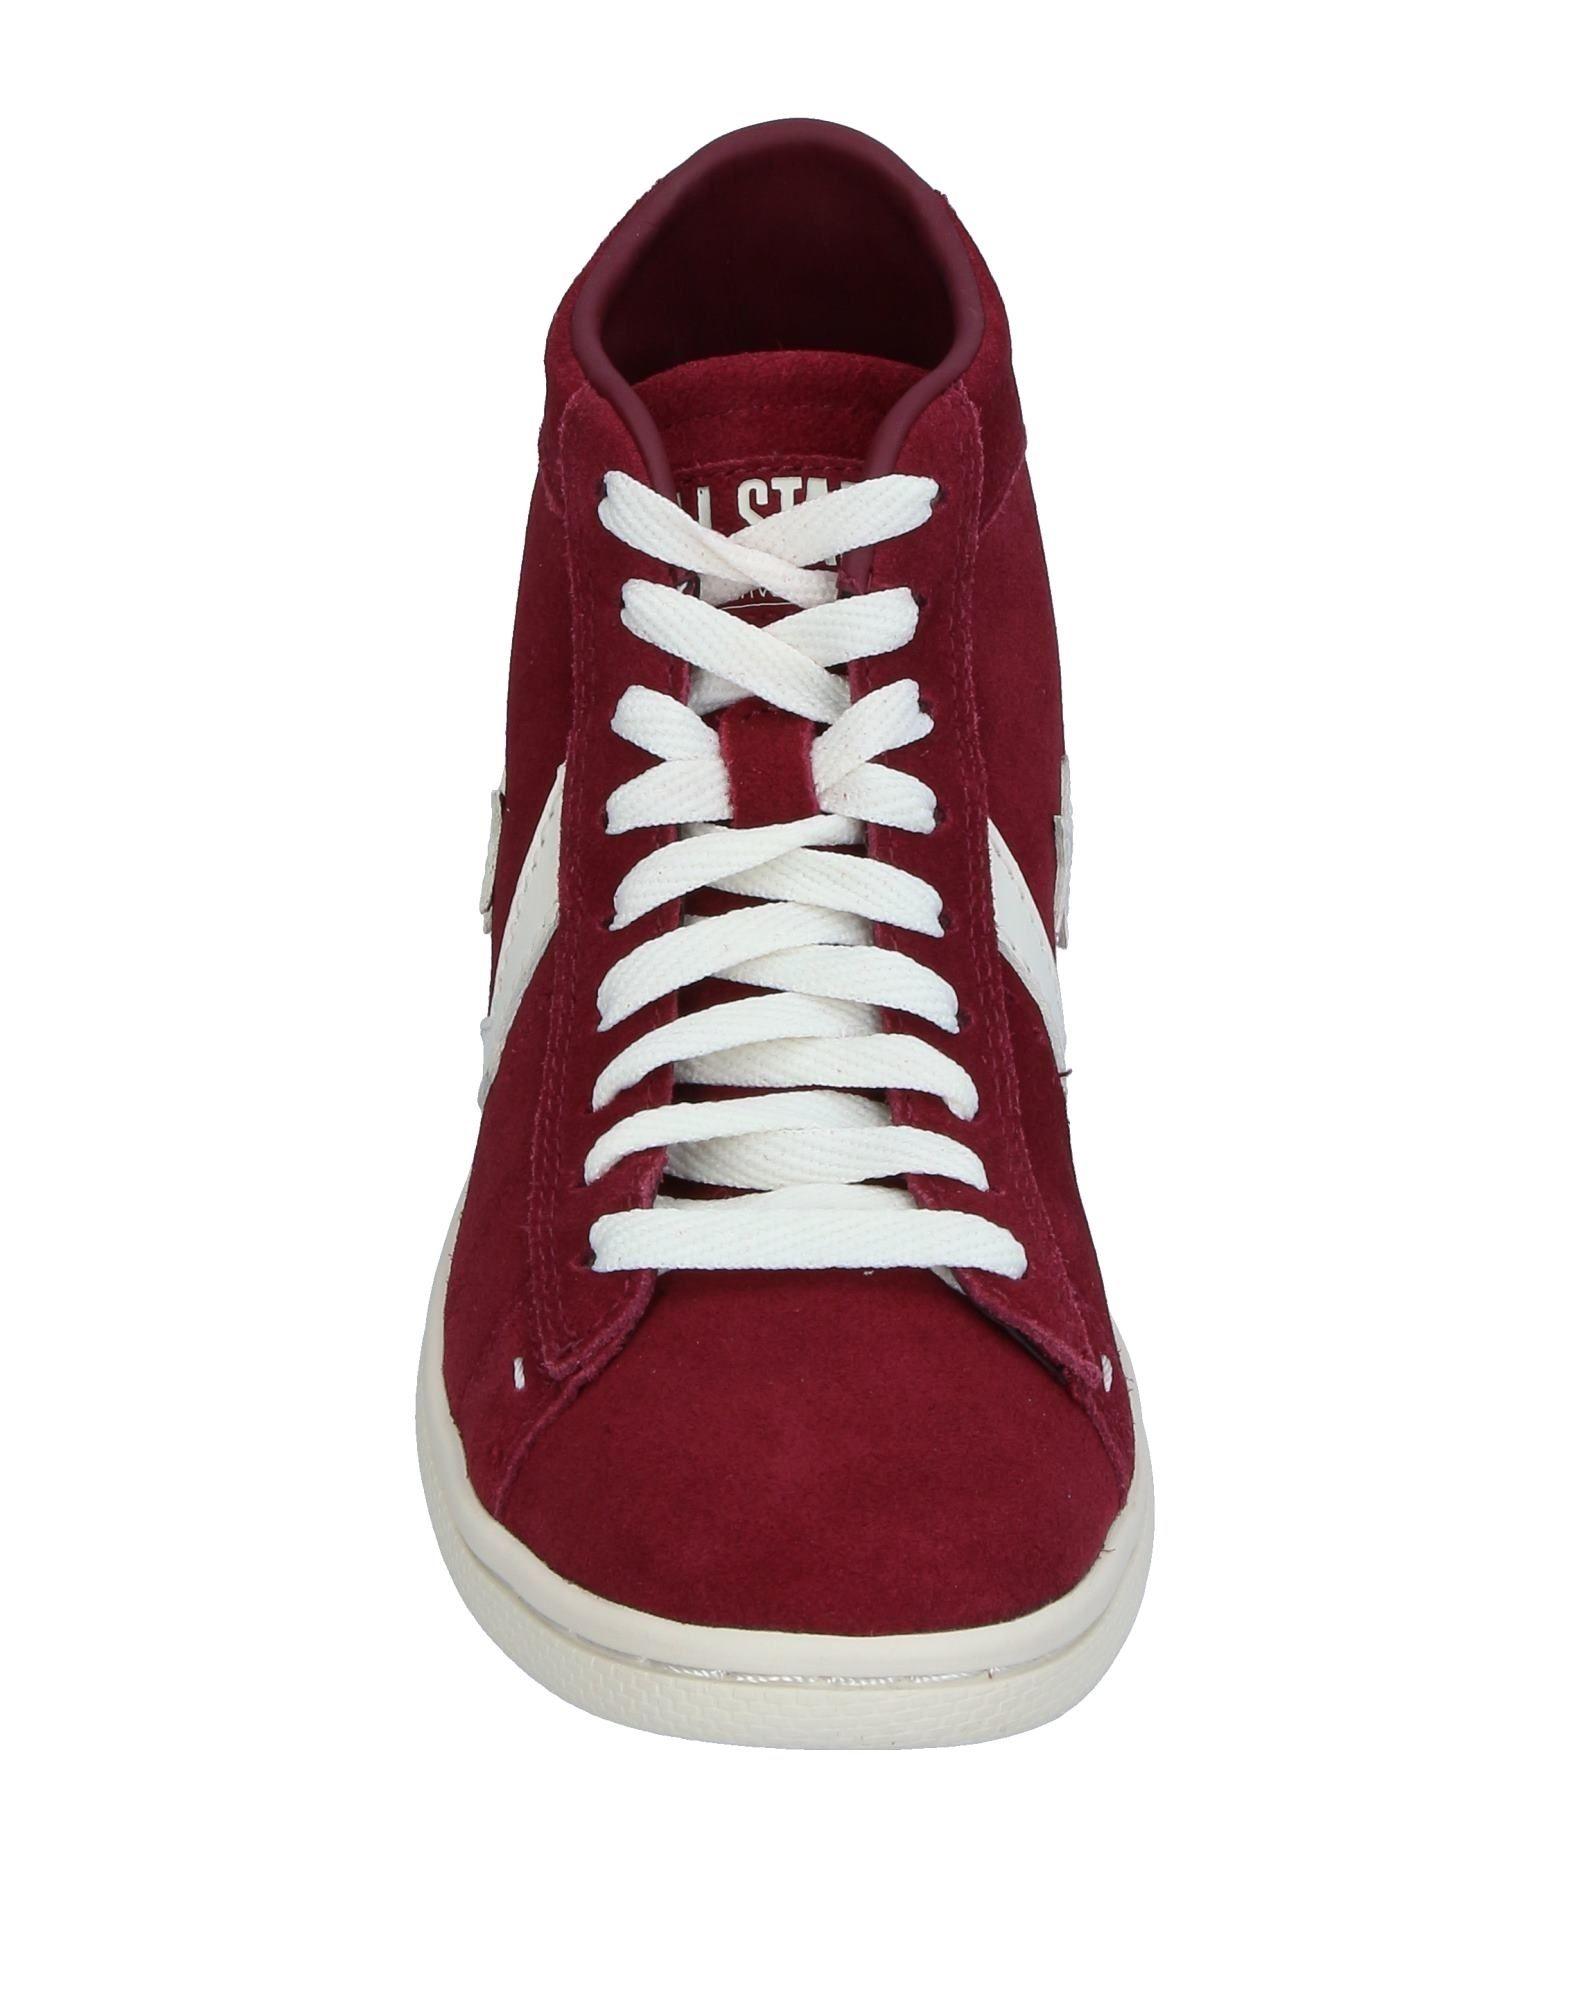 Sneakers Converse Femme - Sneakers Converse sur